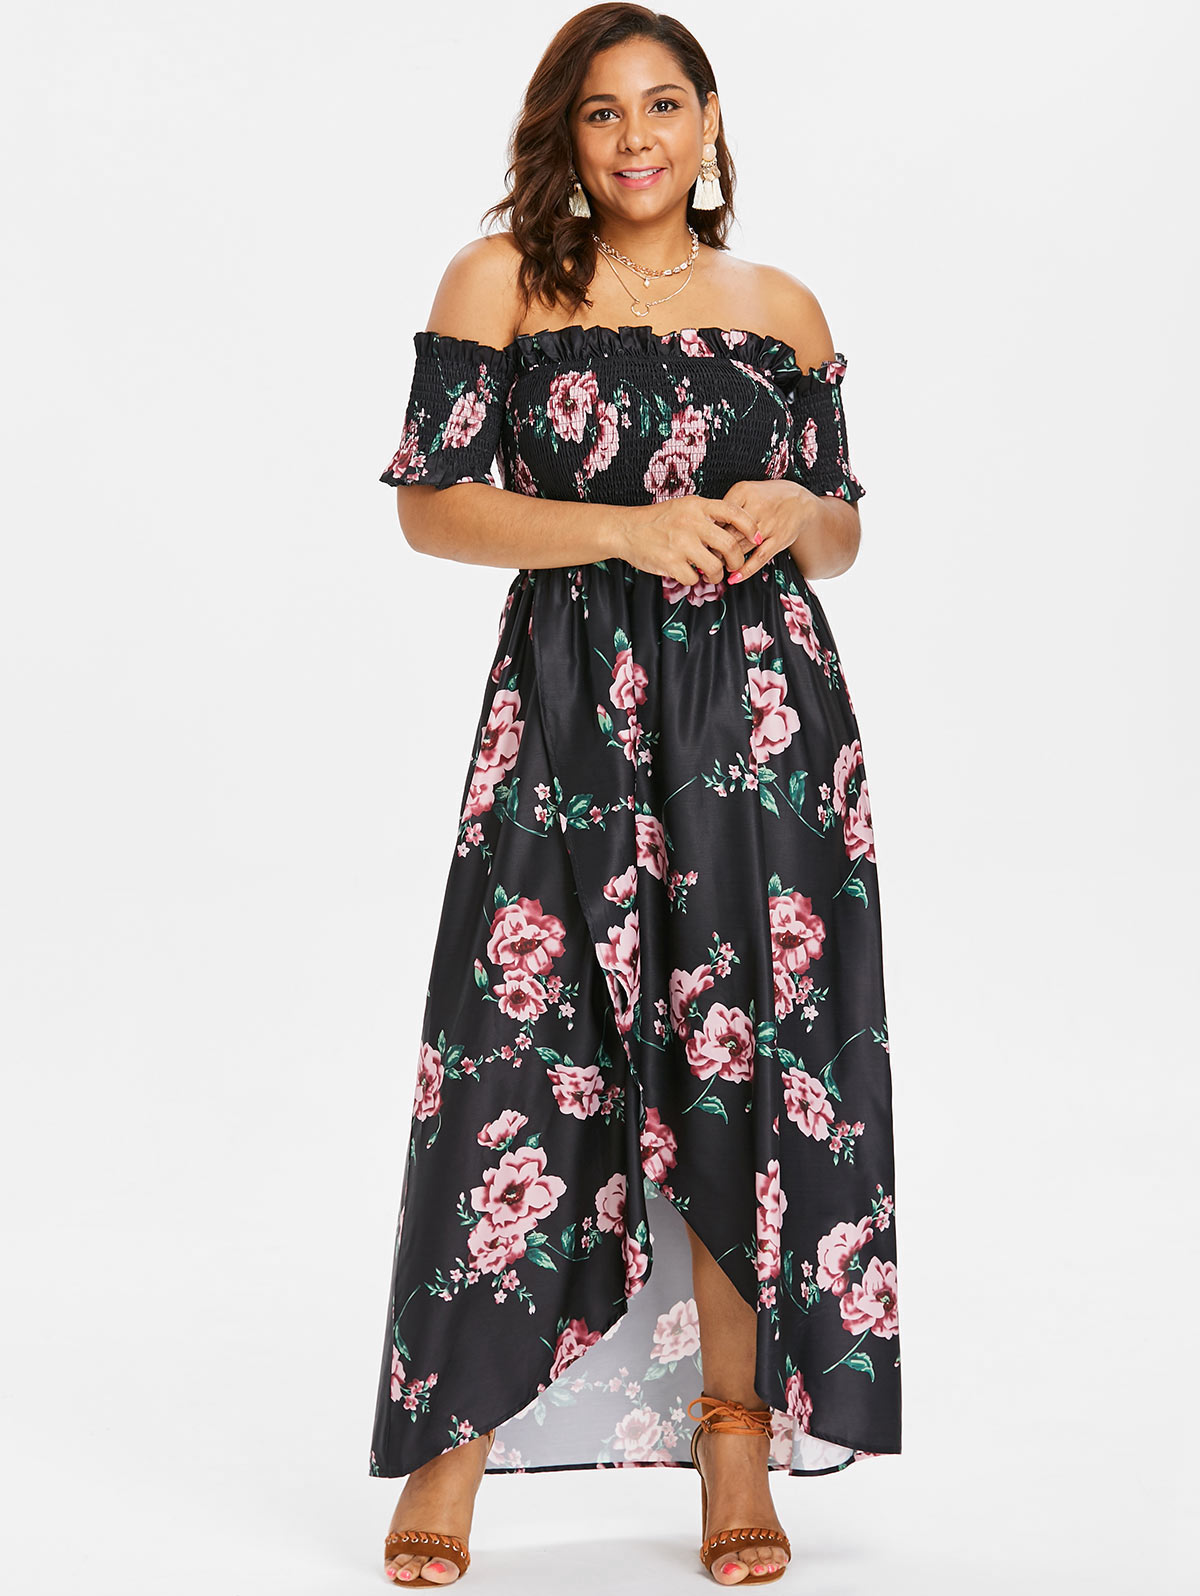 9d8808a0cd01 Silhouette: Asymmetrical Dresses Length: Floor-Length Neckline: Off The  Shoulder Sleeve Length: Short Sleeves Waist: Empire Pattern Type: Floral